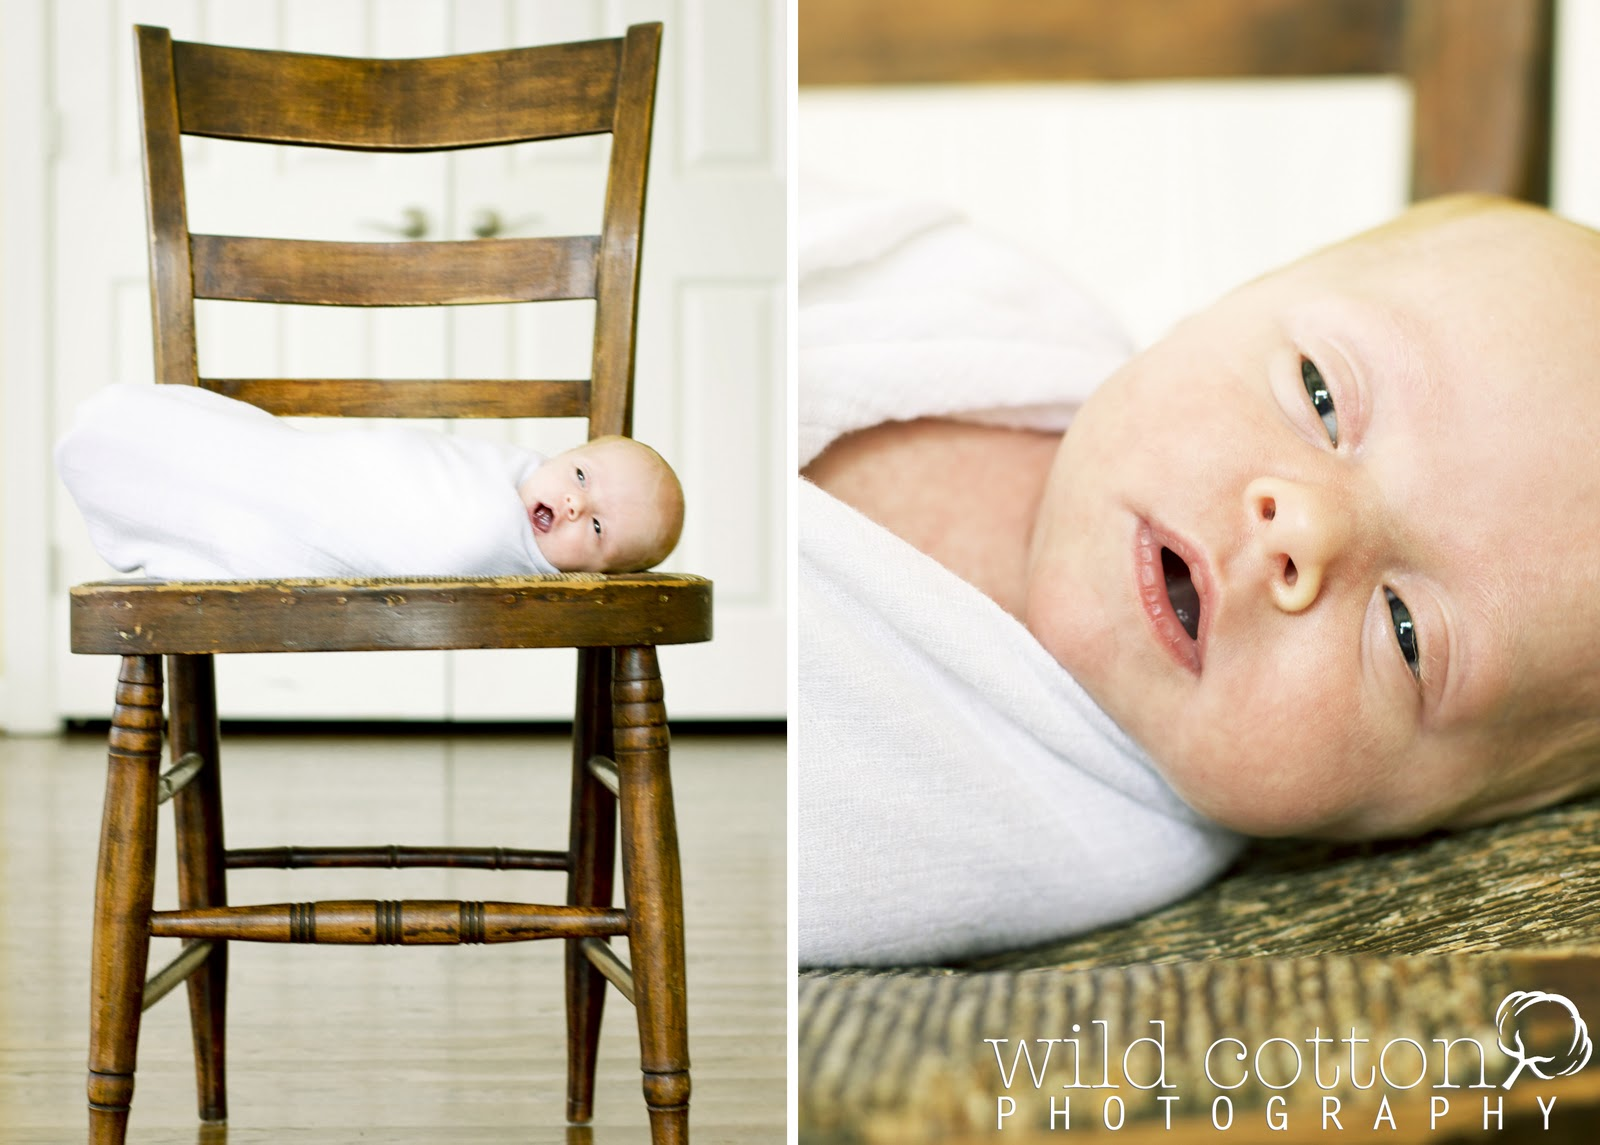 Wild Cotton Photography: Franklin Newborn Photography ...